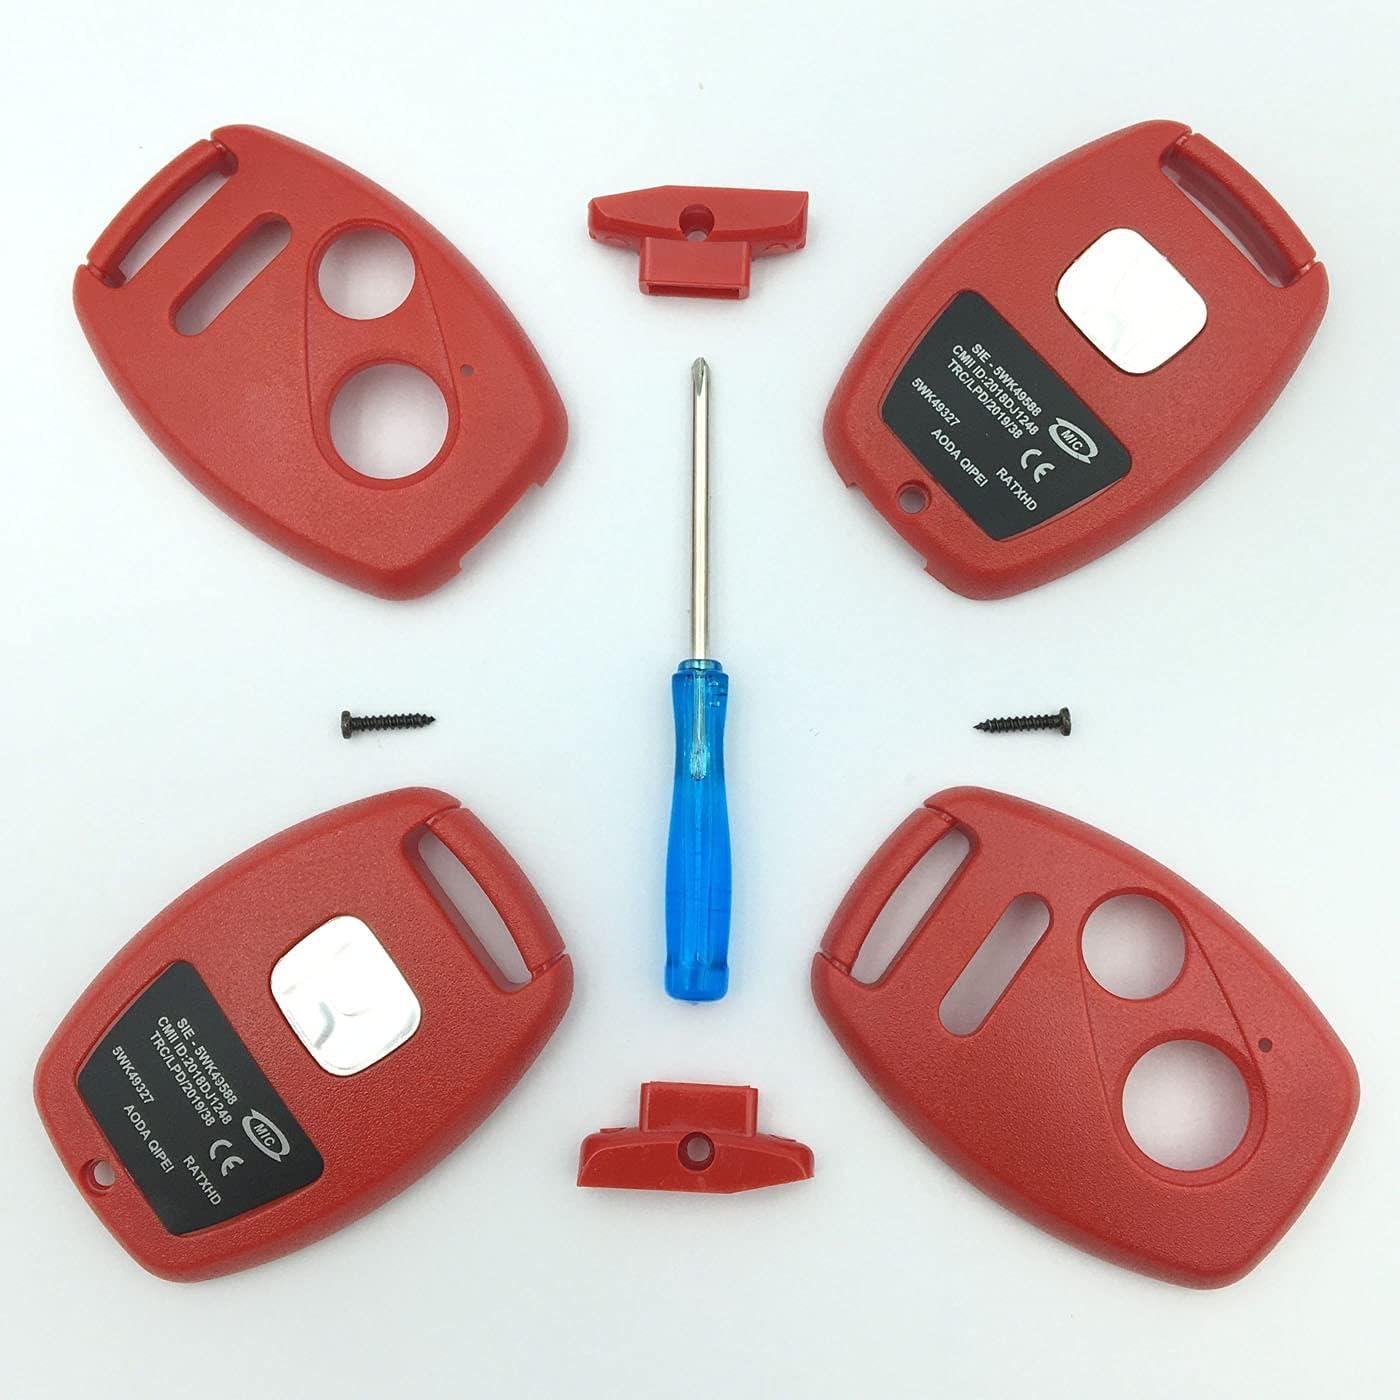 Henrida Keyless Entry Remote Key Replacement for C Housing 5% OFF Austin Mall Honda